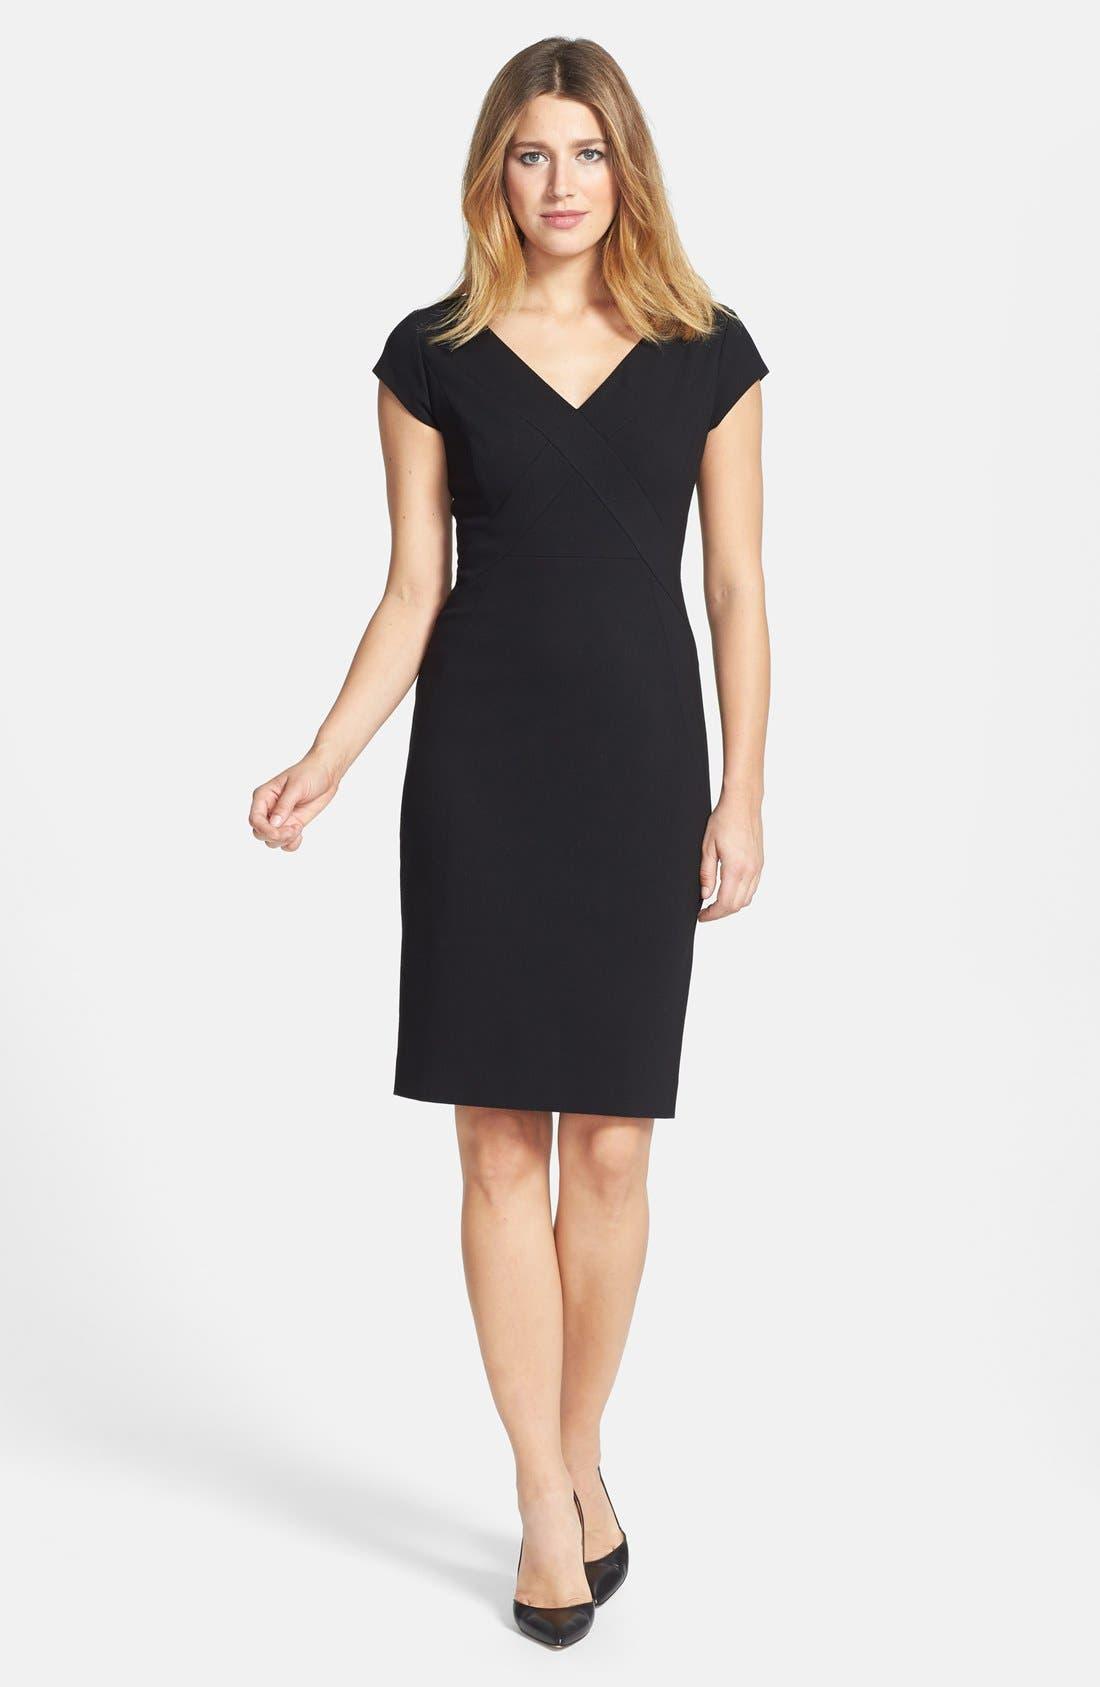 Alternate Image 1 Selected - Classiques Entier® Ponte Knit V-Neck Sheath Dress (Regular & Petite)